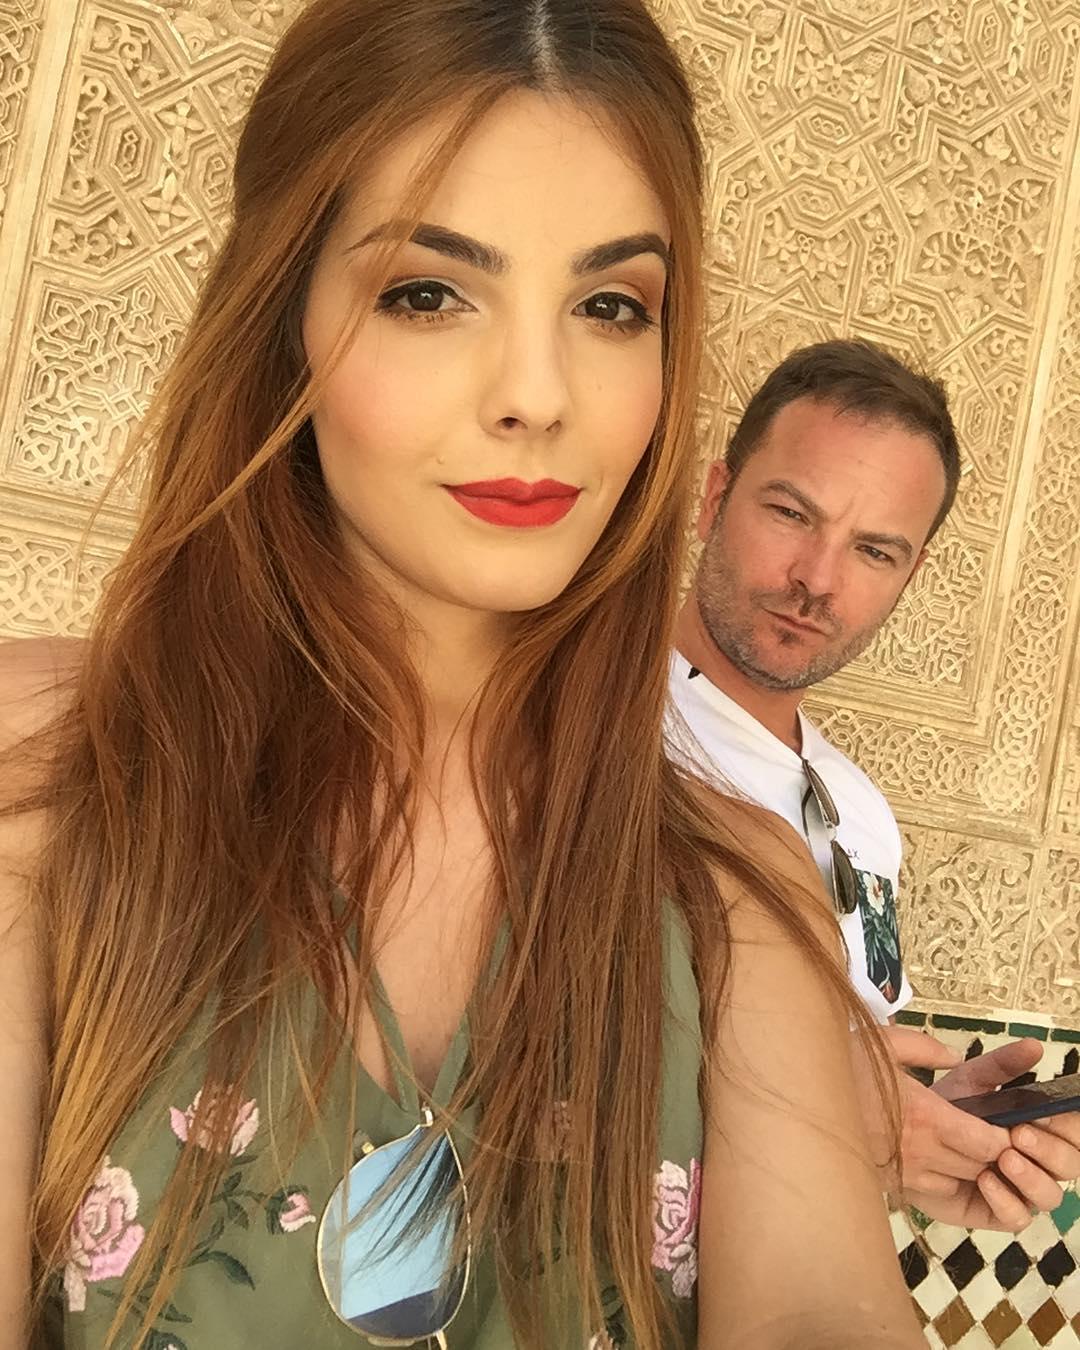 nathalie de oliveira, miss bom jardim 2019/1st runner-up de miss international queen 2016. - Página 3 37355710